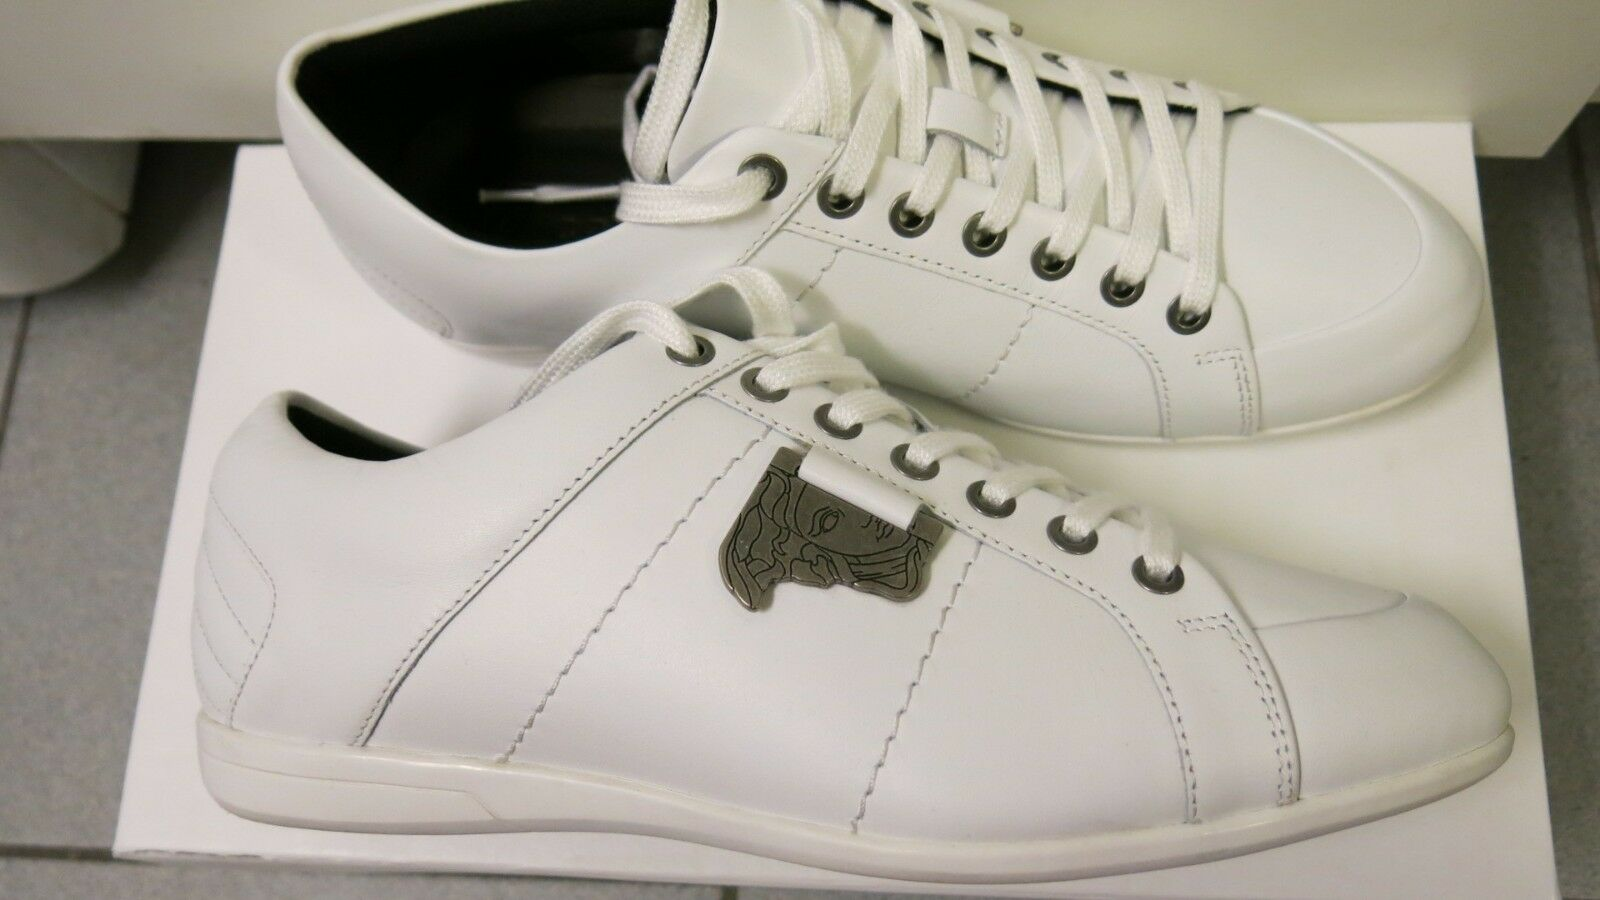 Versace Collection Original Medusa Logo Leather shoes Men's Sneakers UK7 EU41